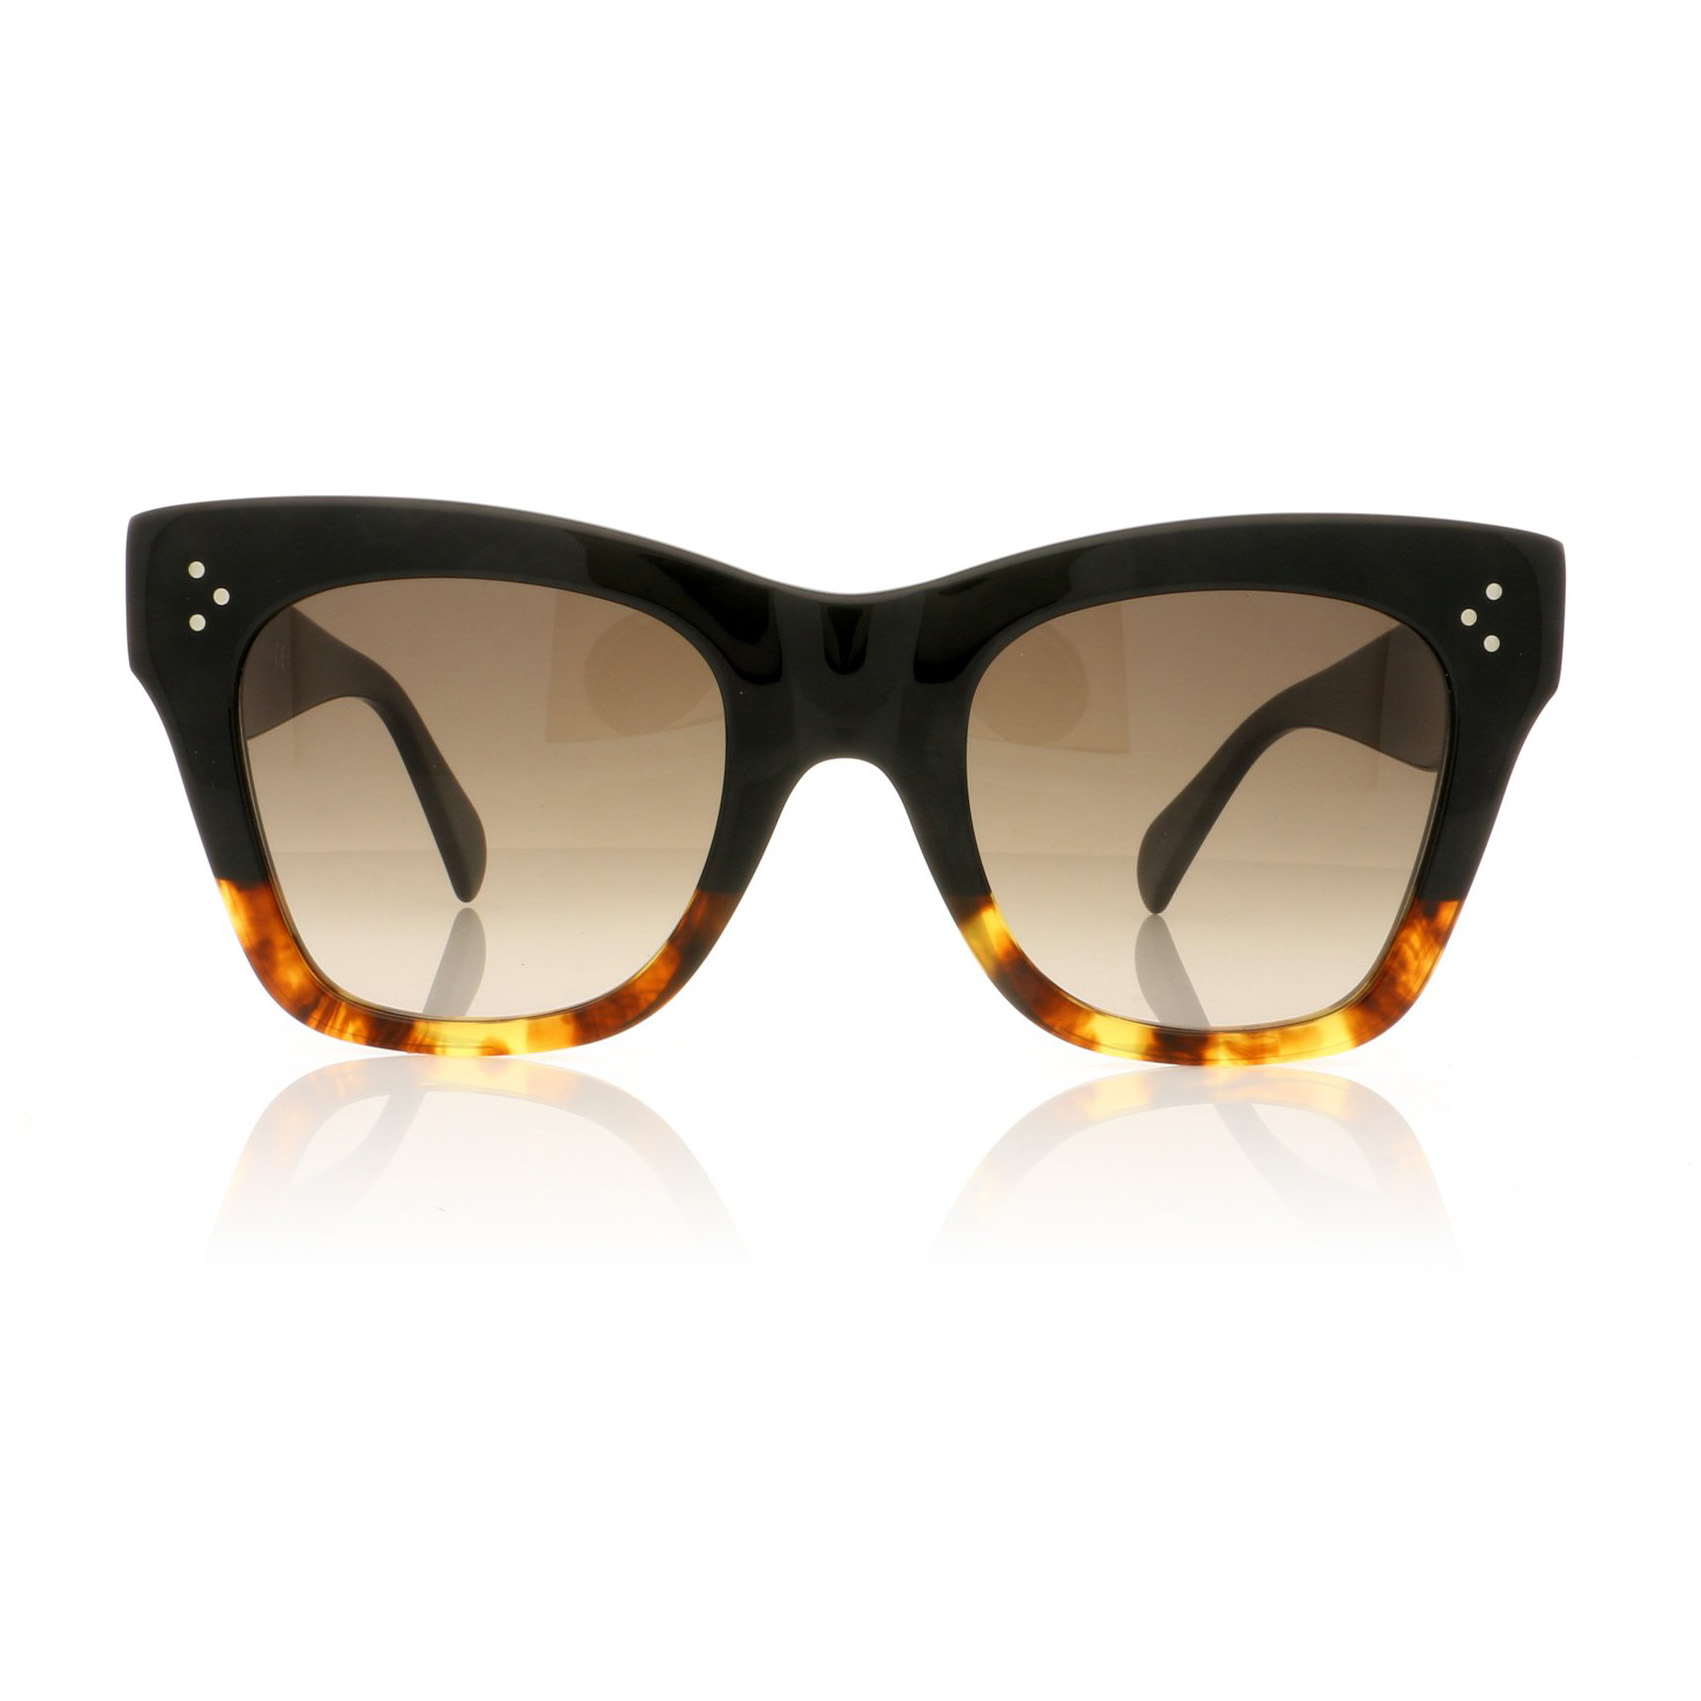 CELINE- CL40004I Sunglasses  £270 (Sold Out)  COLOUR Black/Other/Gradient Roviex Lenses  CATEGORY SUN  MATERIAL Acetate  SHAPE Cat Eye